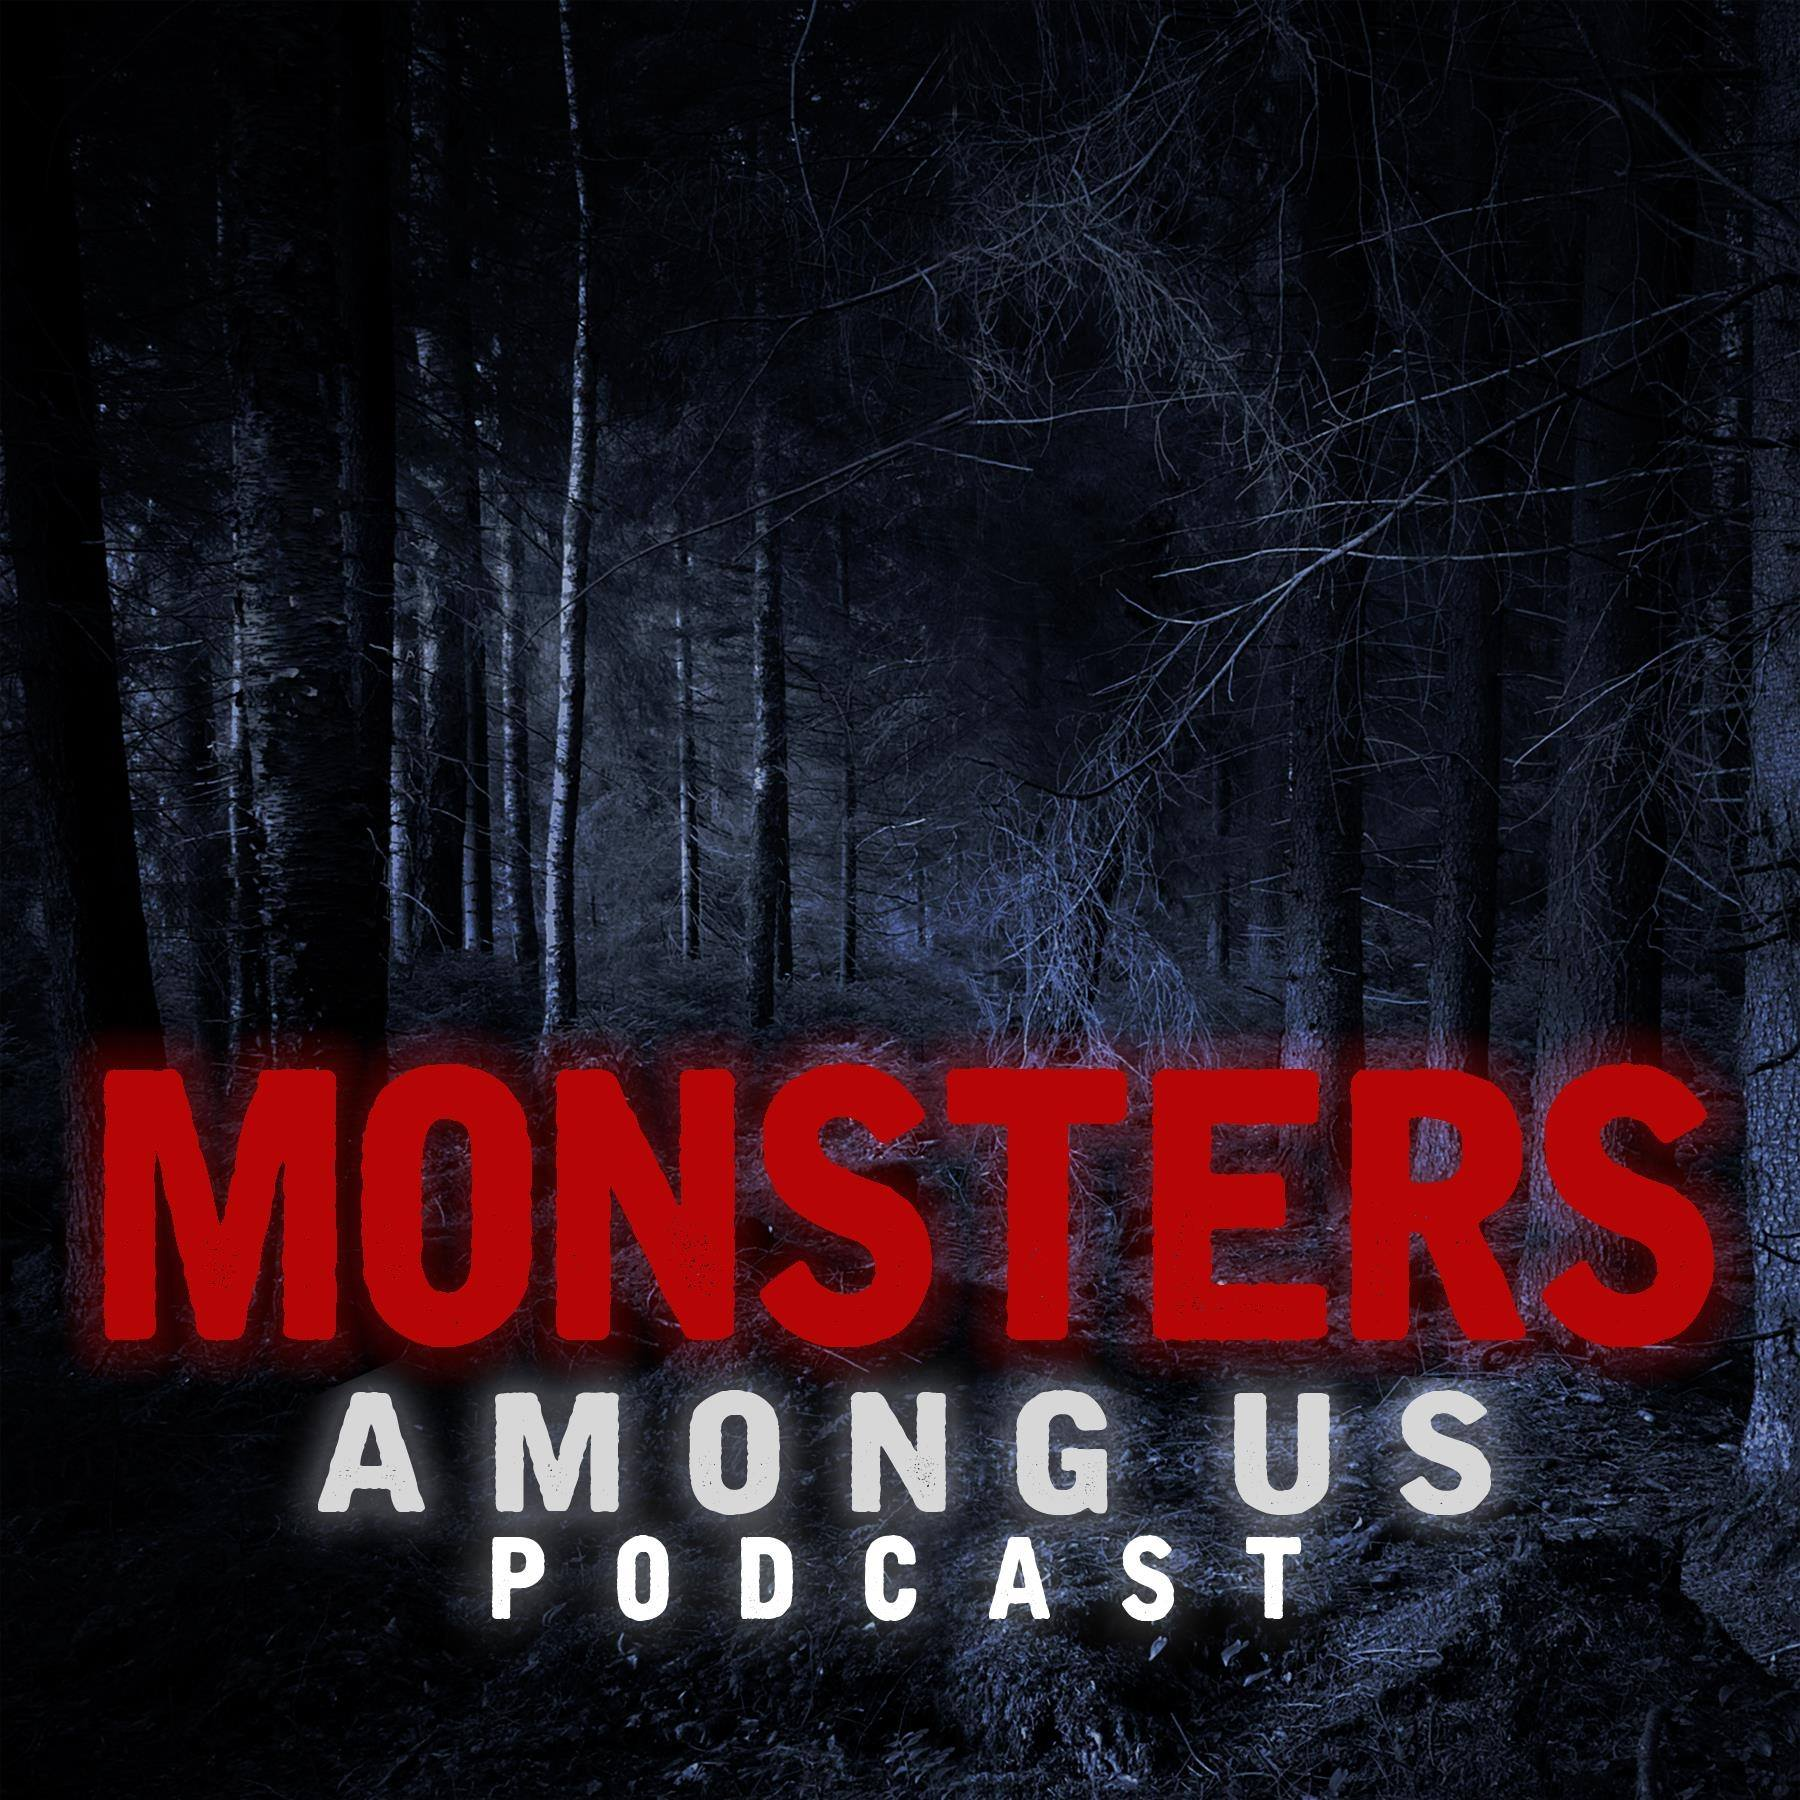 Monsters Among Us Podcast | Podbay